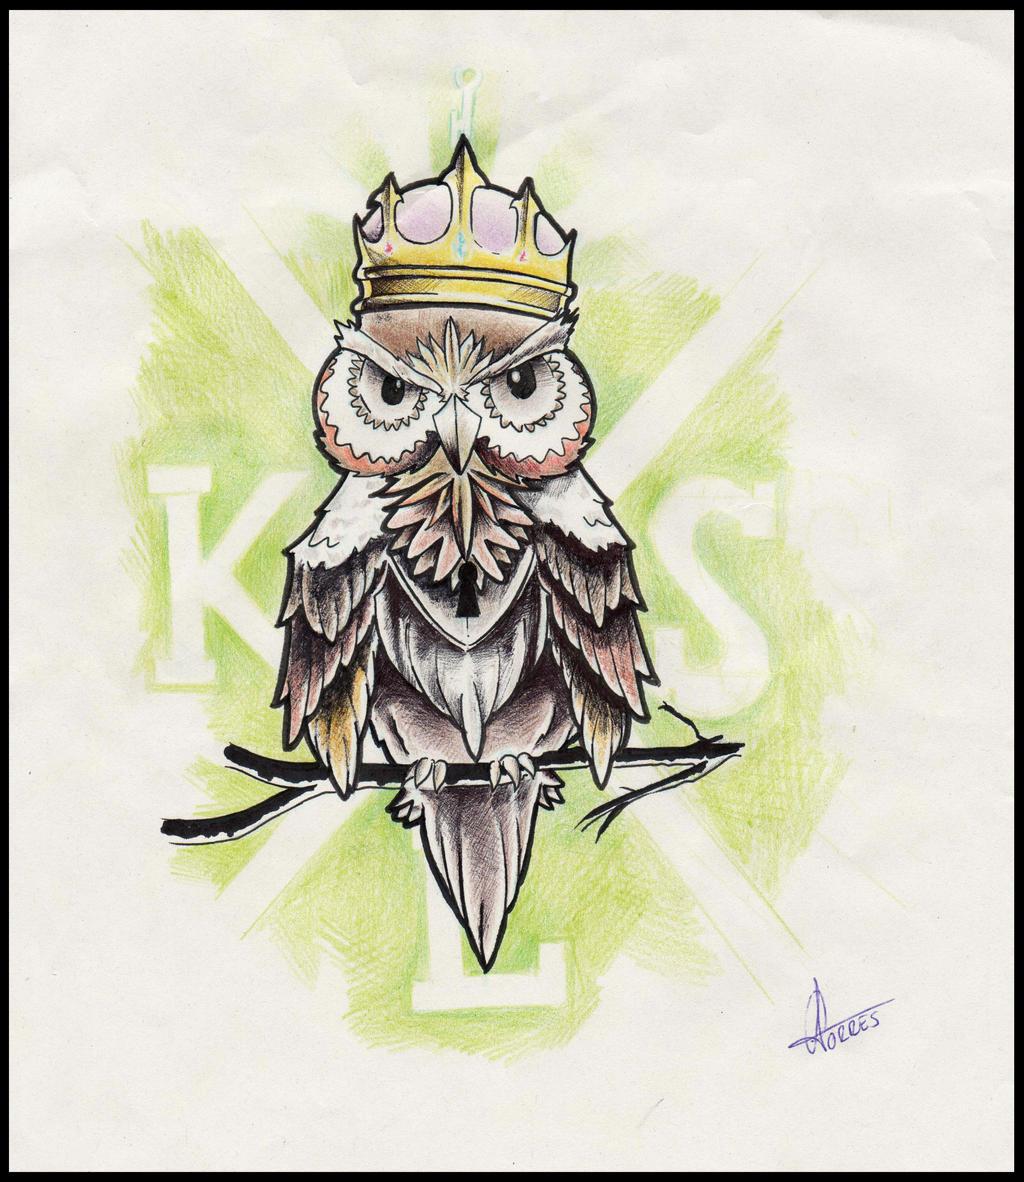 New school tattoo design - New School Tattoo Design 34